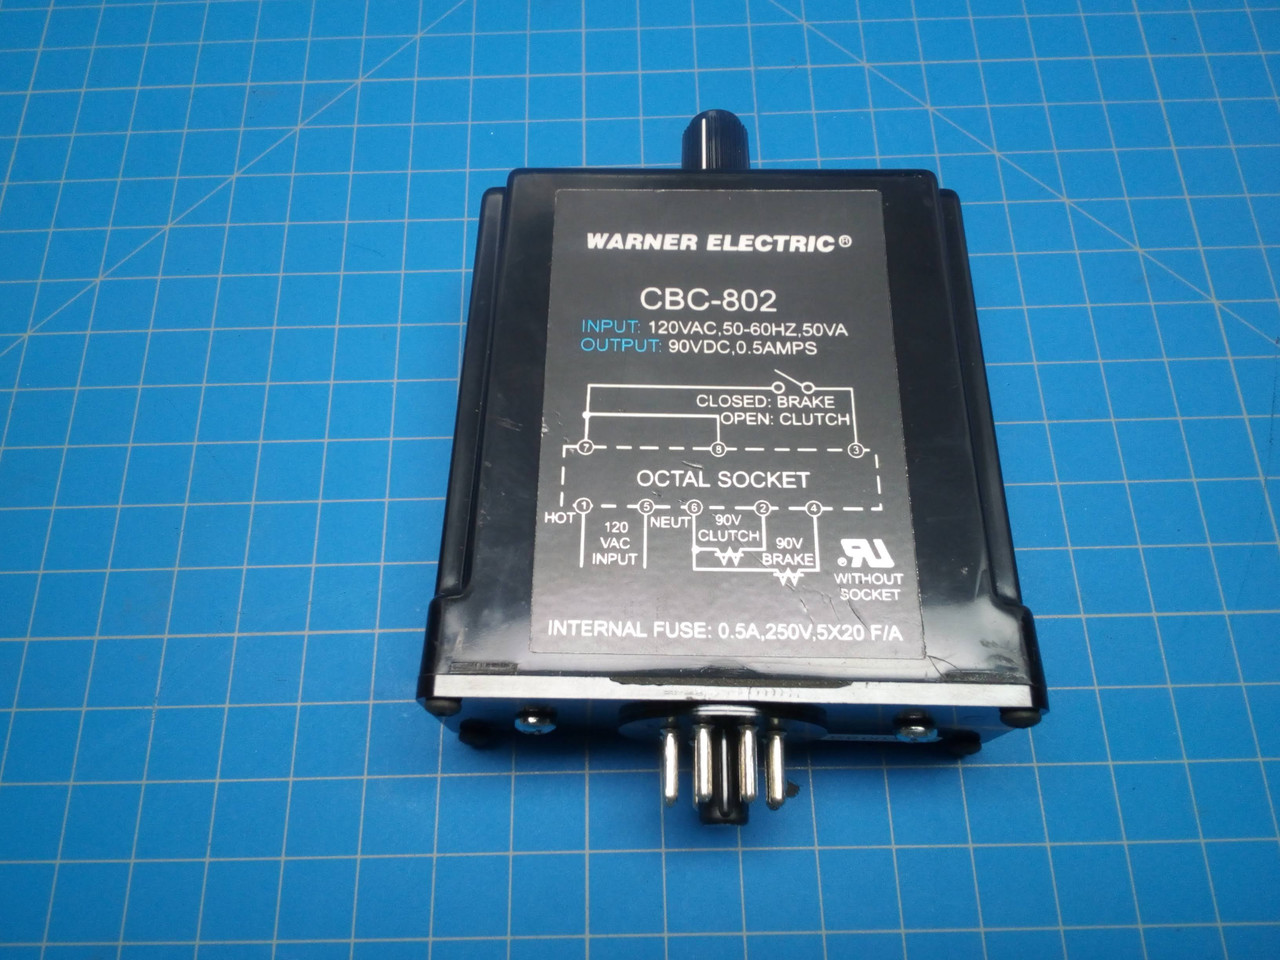 Warner Electric Plug-In Clutch/Brake Control CBC-802 - P01-000073